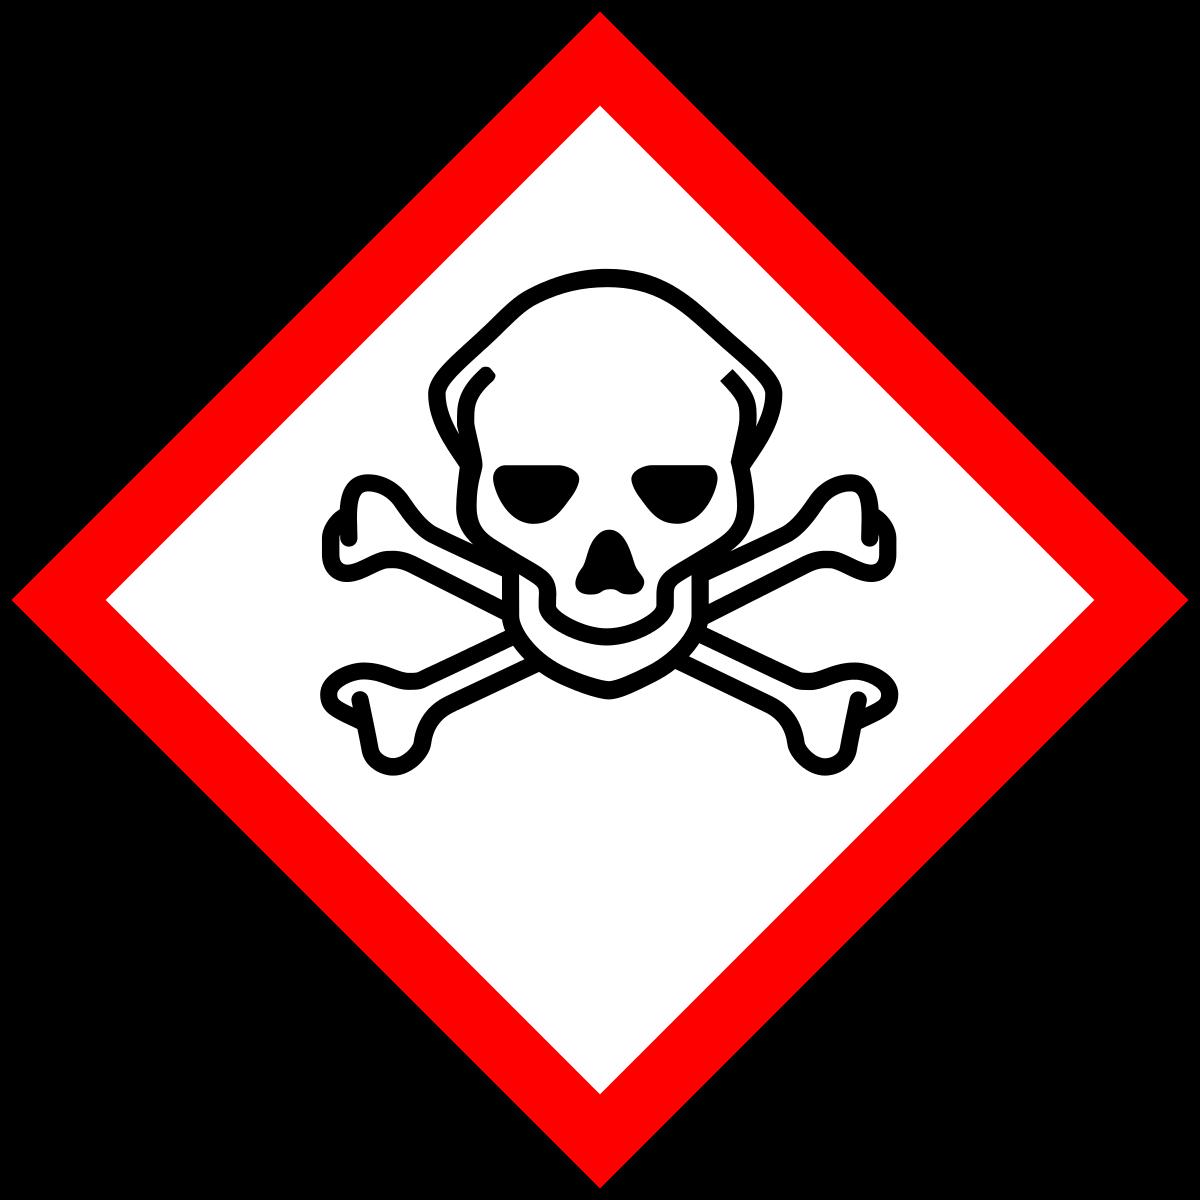 Toxic clipart health hazard Symbol  Wikipedia Hazard